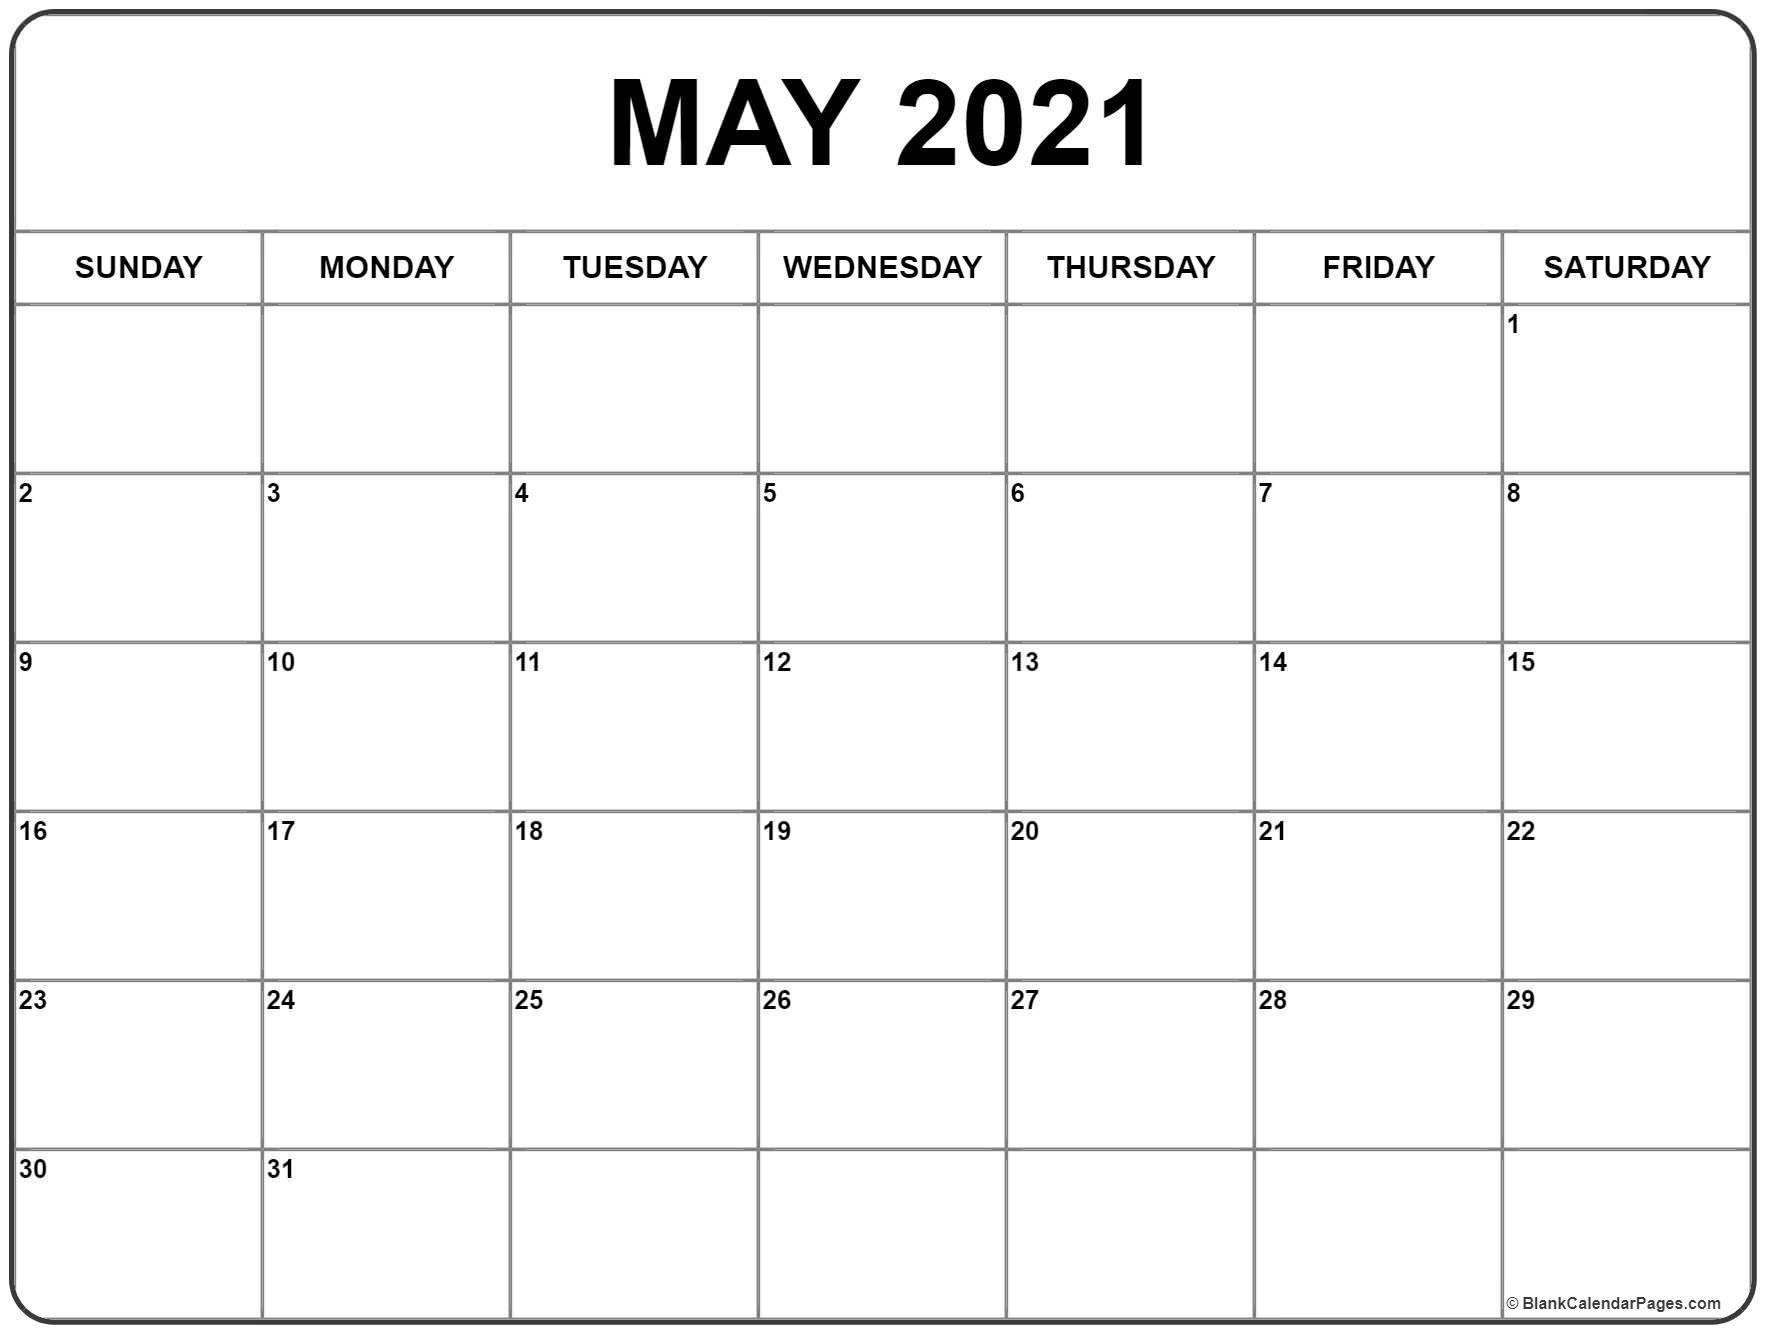 May 2021 Calendar | Free Printable Monthly Calendars pertaining to Monthly Fill In Printable Calendar 2021